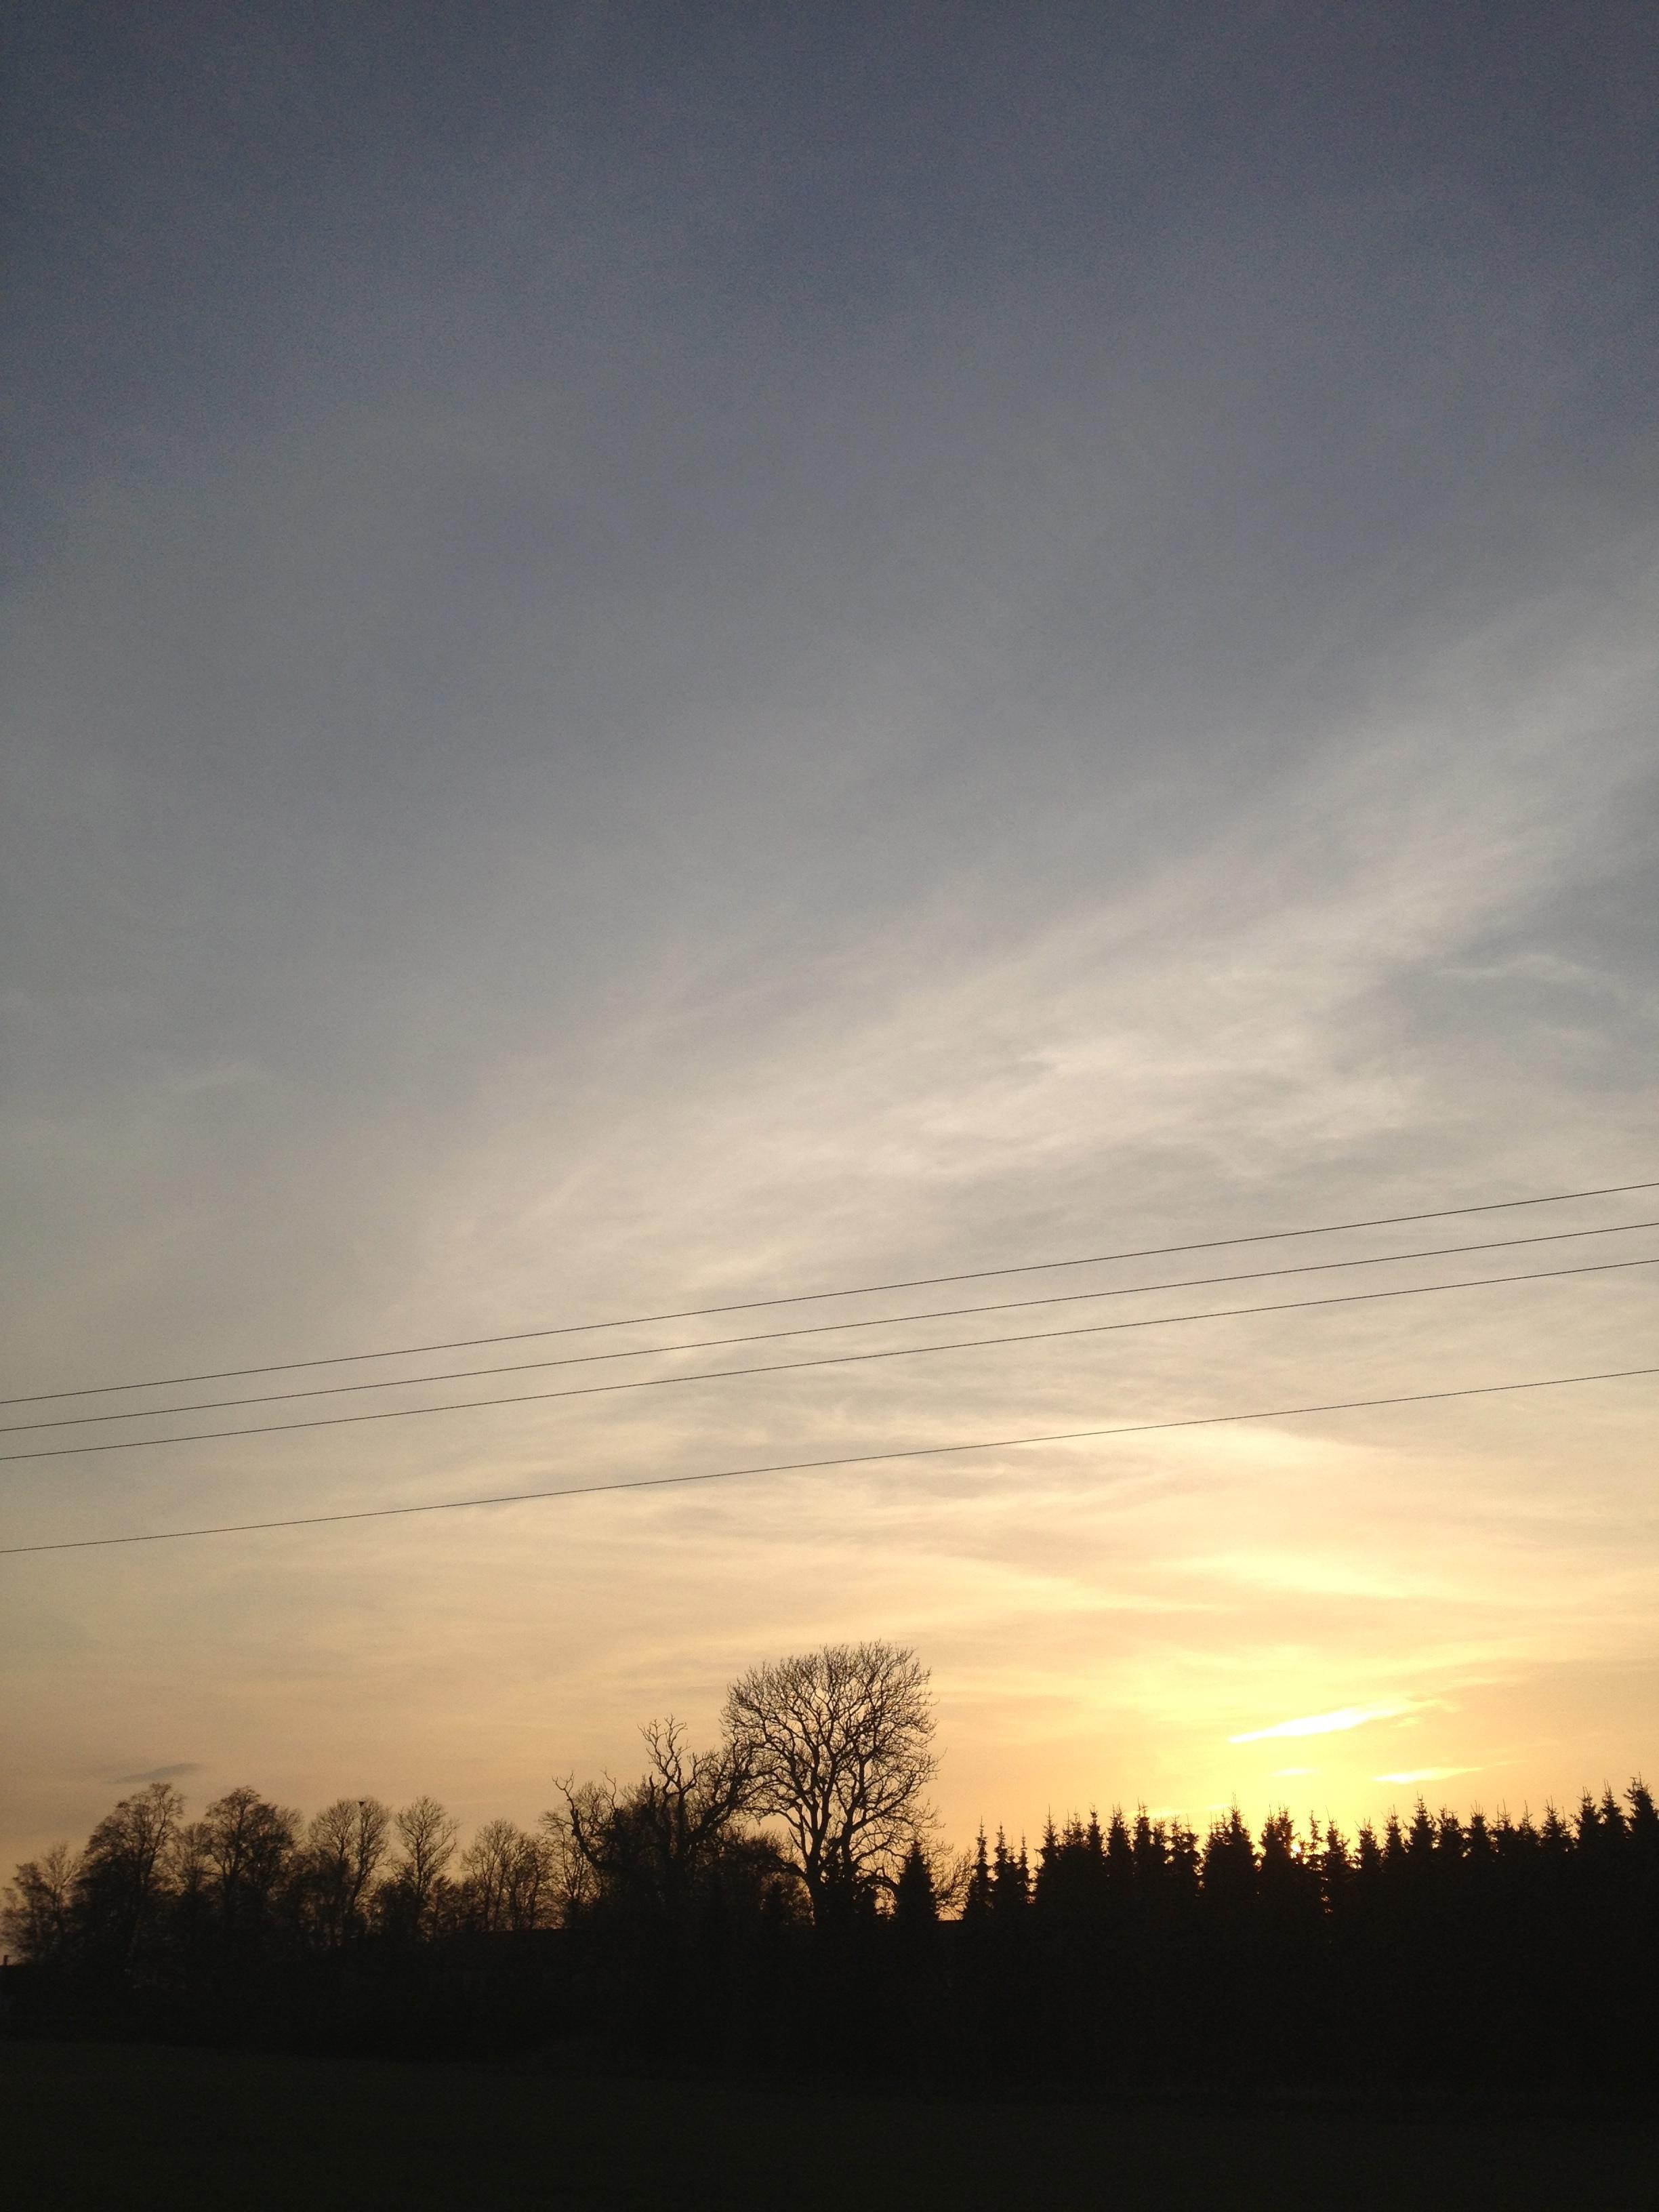 Wallpaper Sunlight Landscape Sunset Field Sunrise Evening